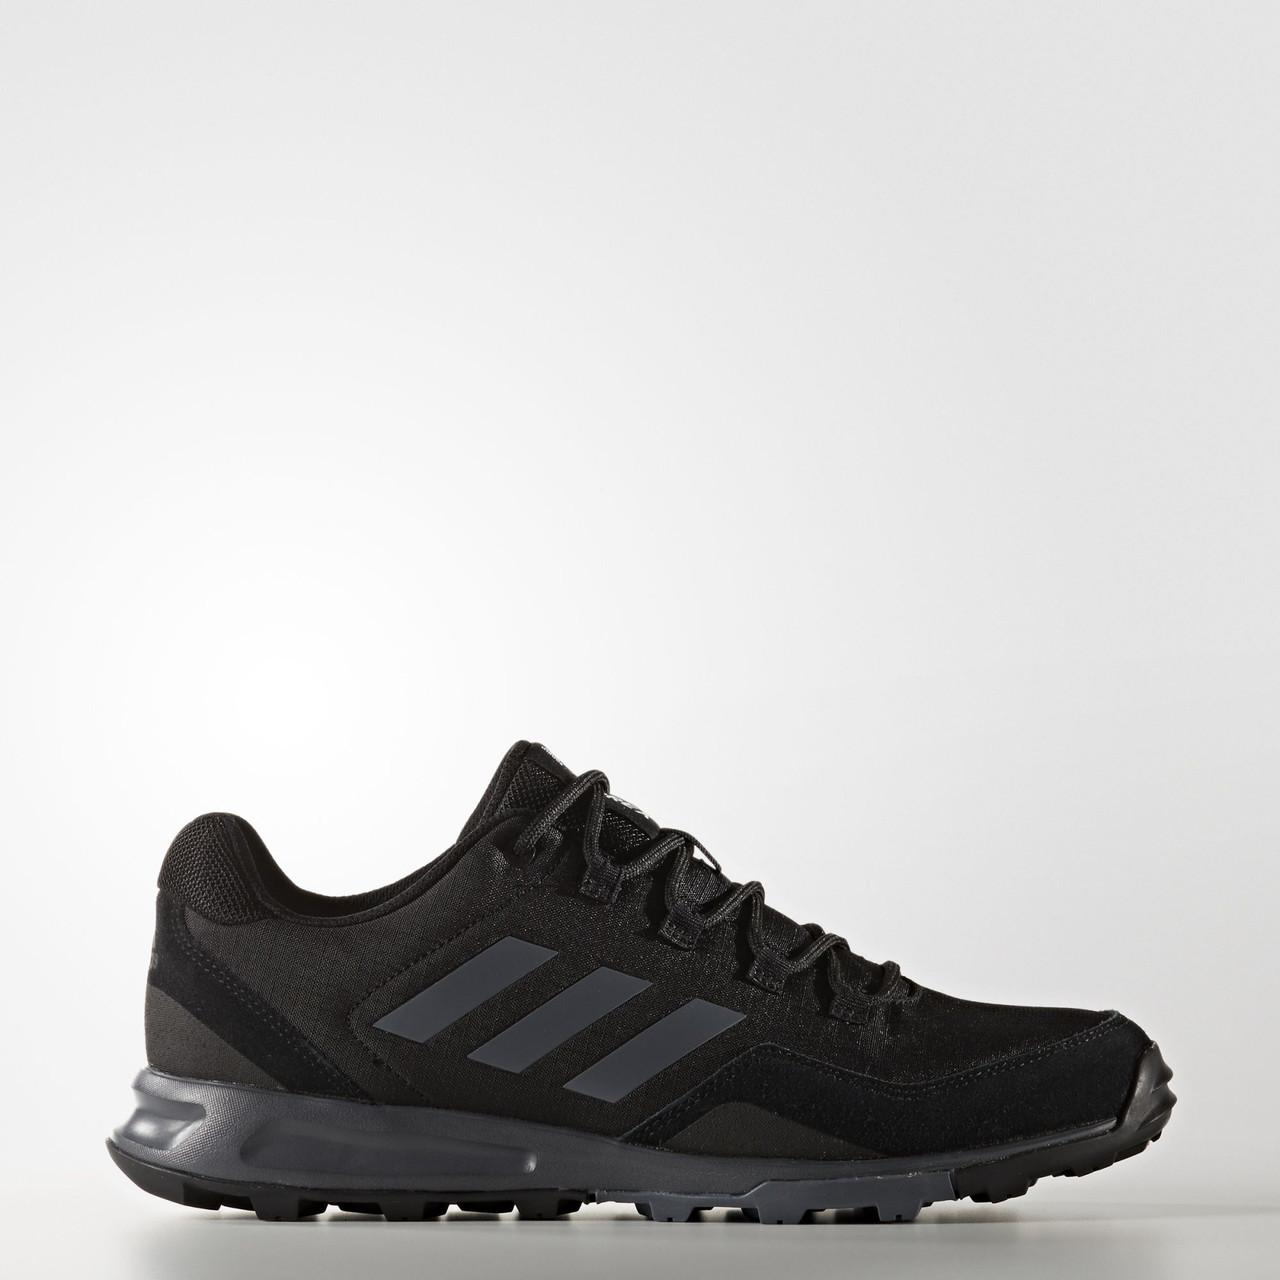 Кроссовки Adidas Tivid M BB4608